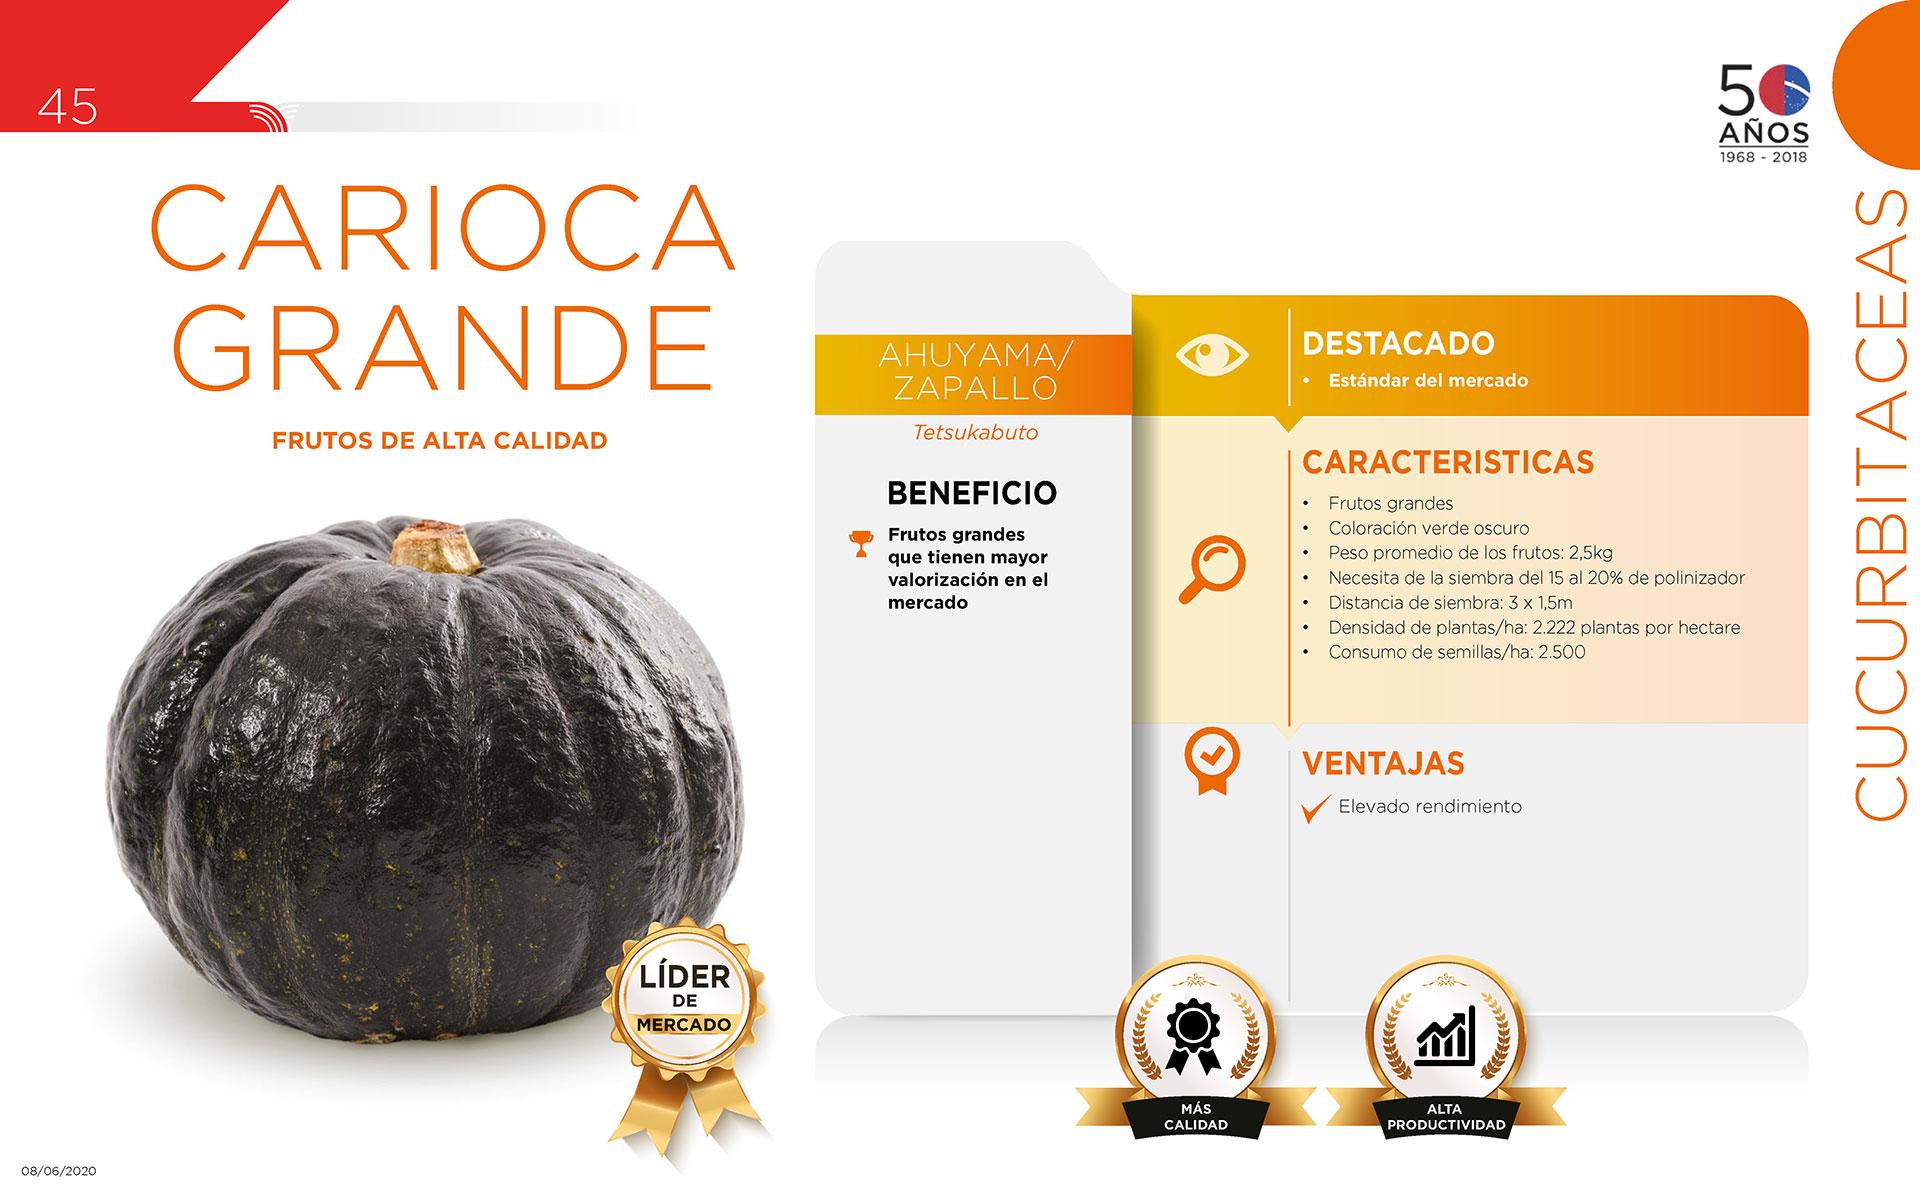 Carioca Grande - Cucurbitaceas